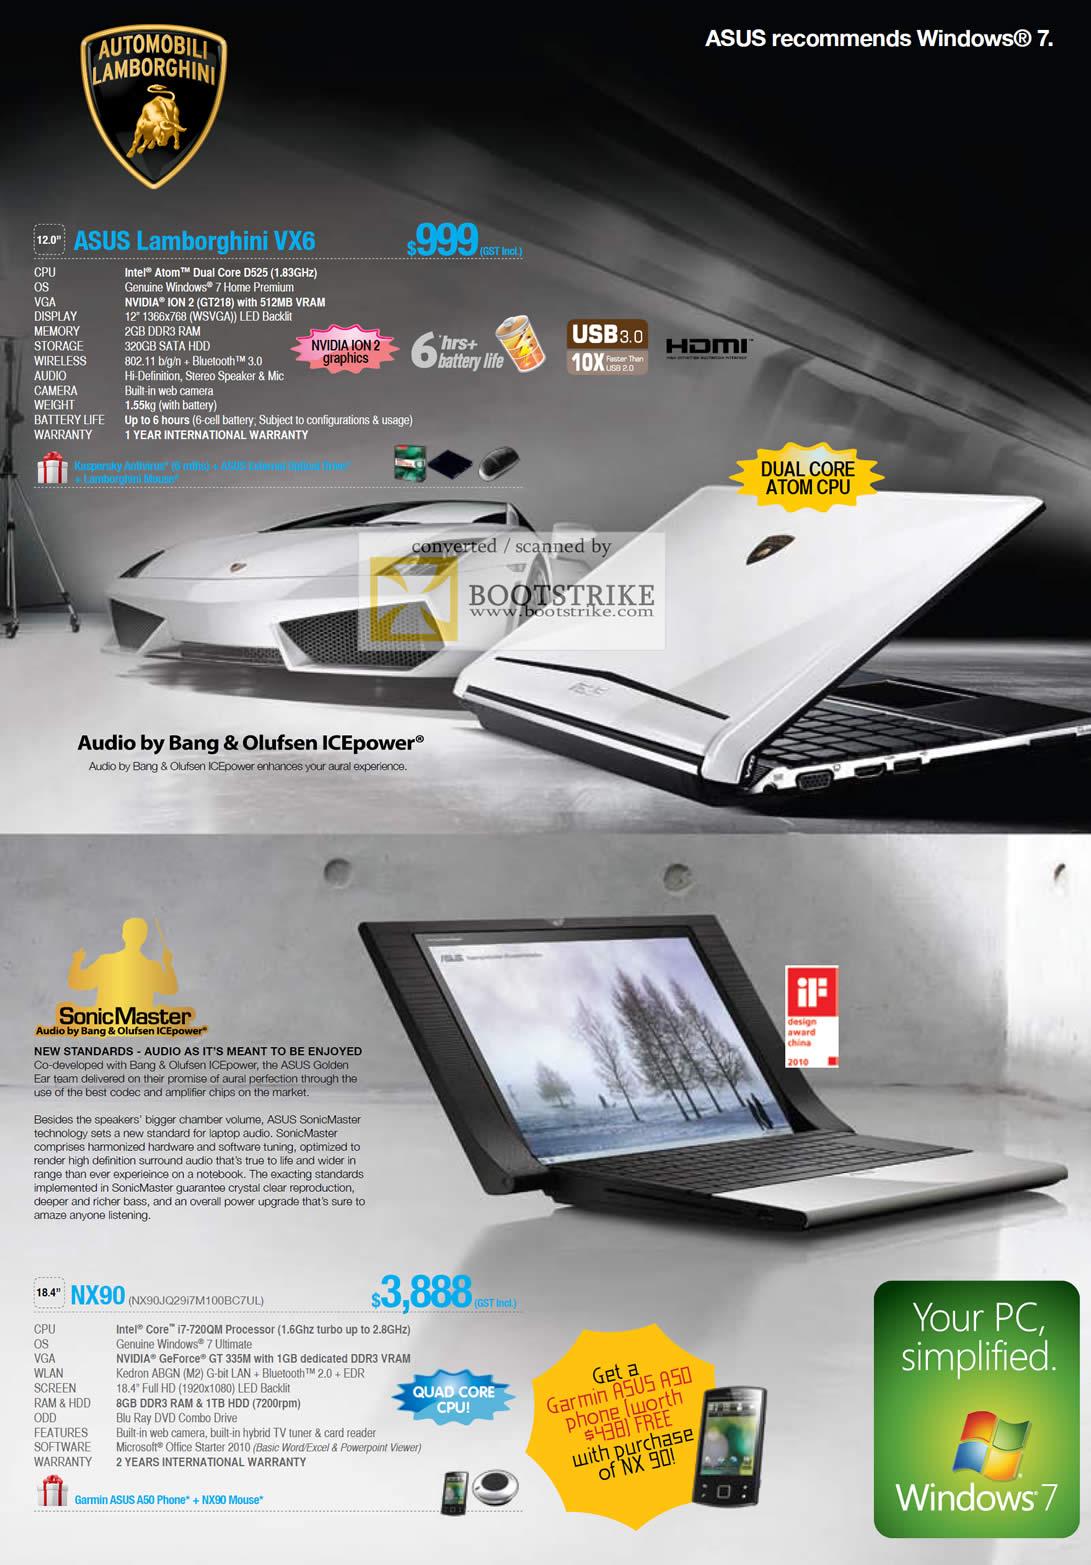 IT Show 2011 price list image brochure of ASUS Lamborghini VX6 Sonicmaster NX90